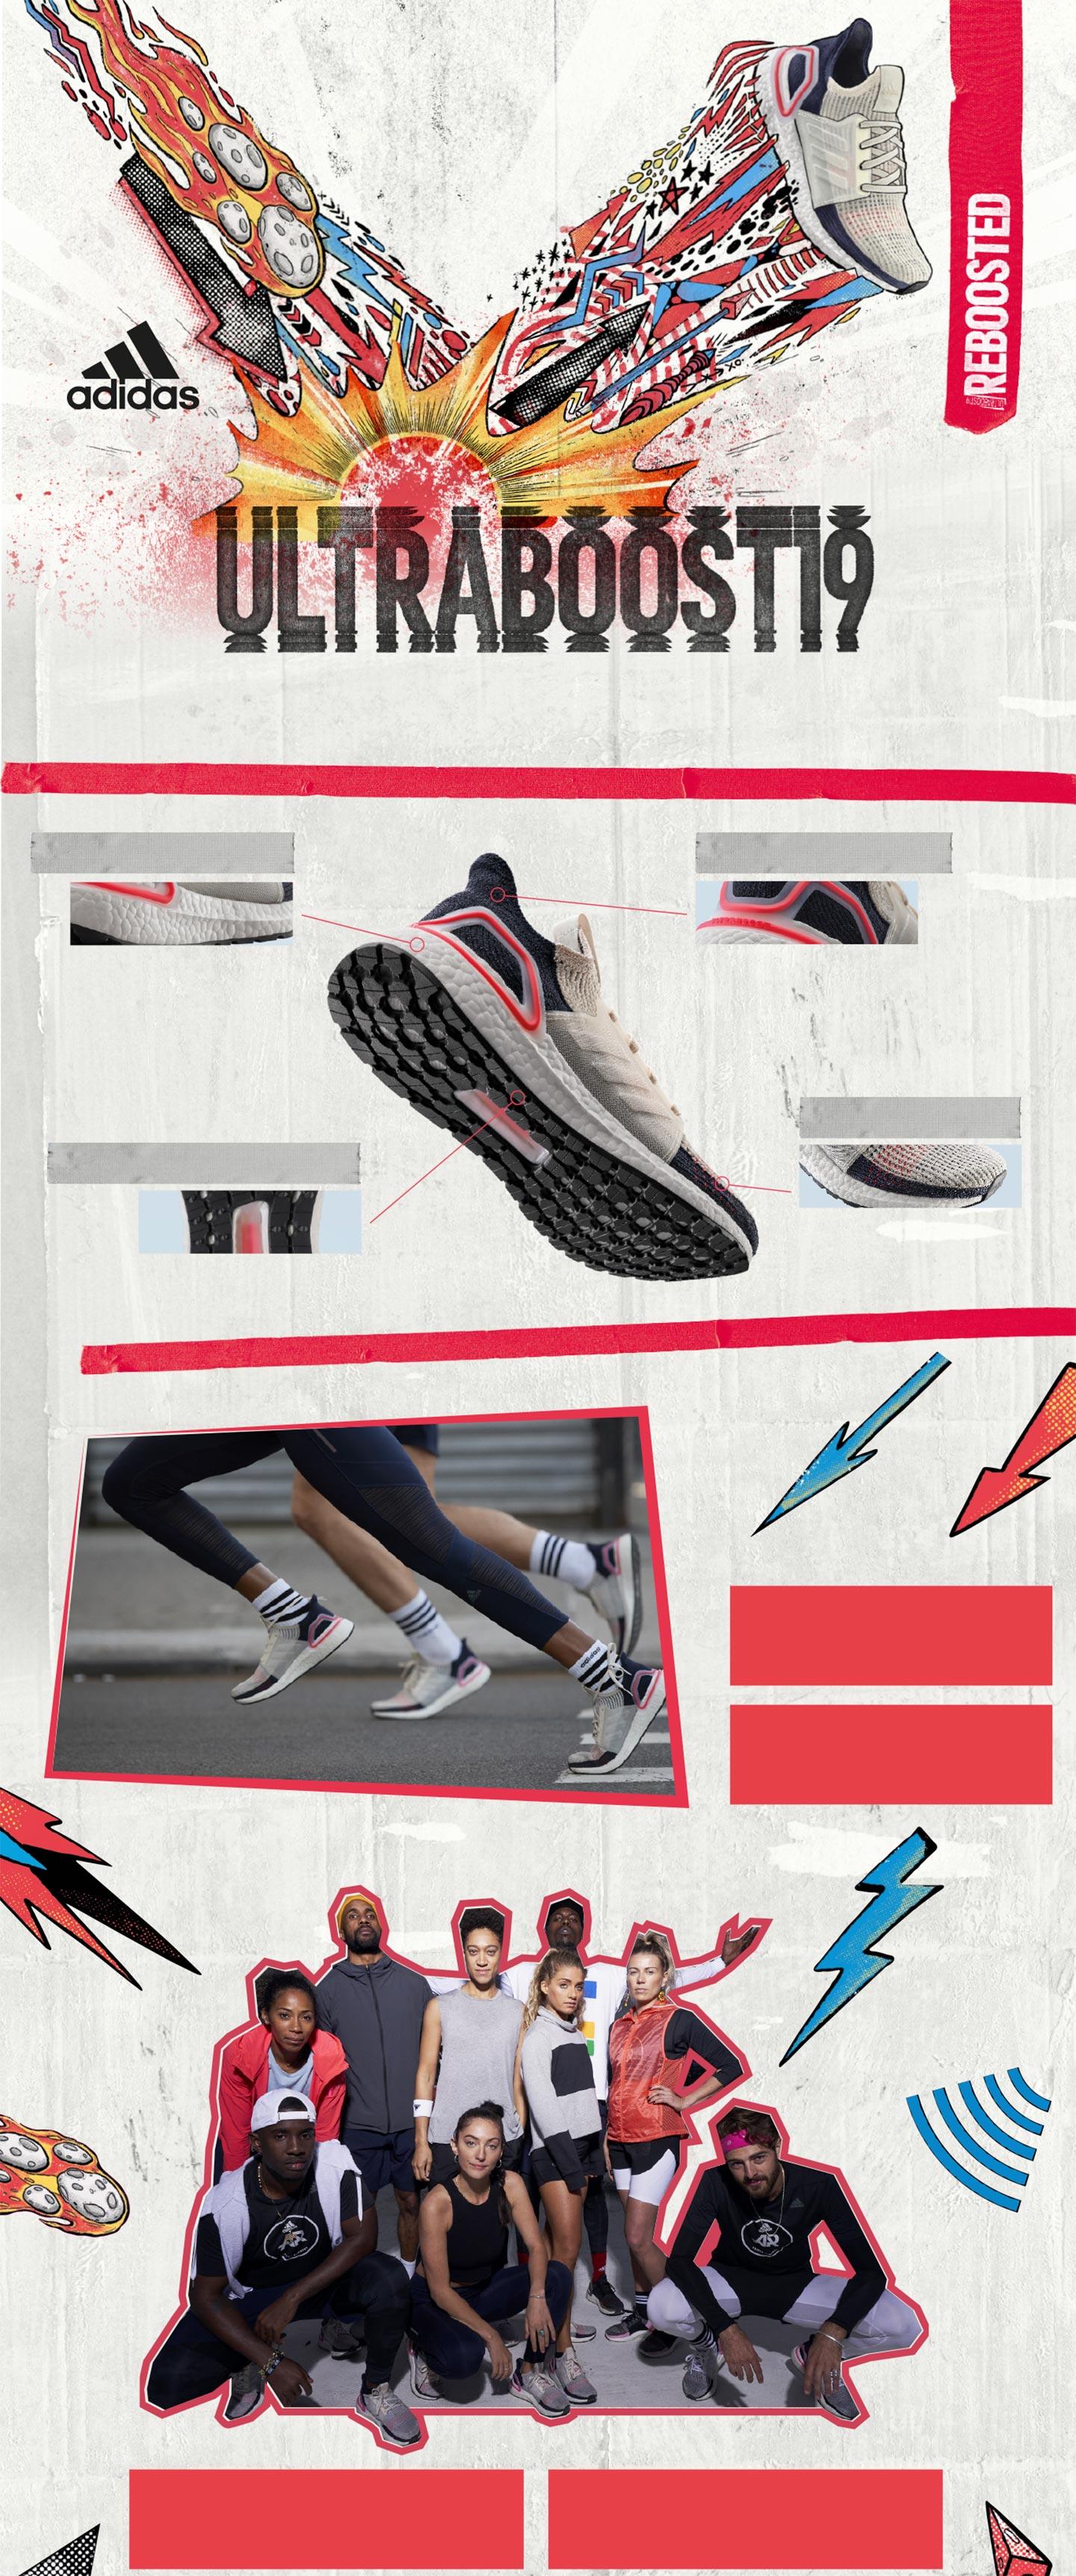 Adidas UltraBOOST 19 Top4Running.es